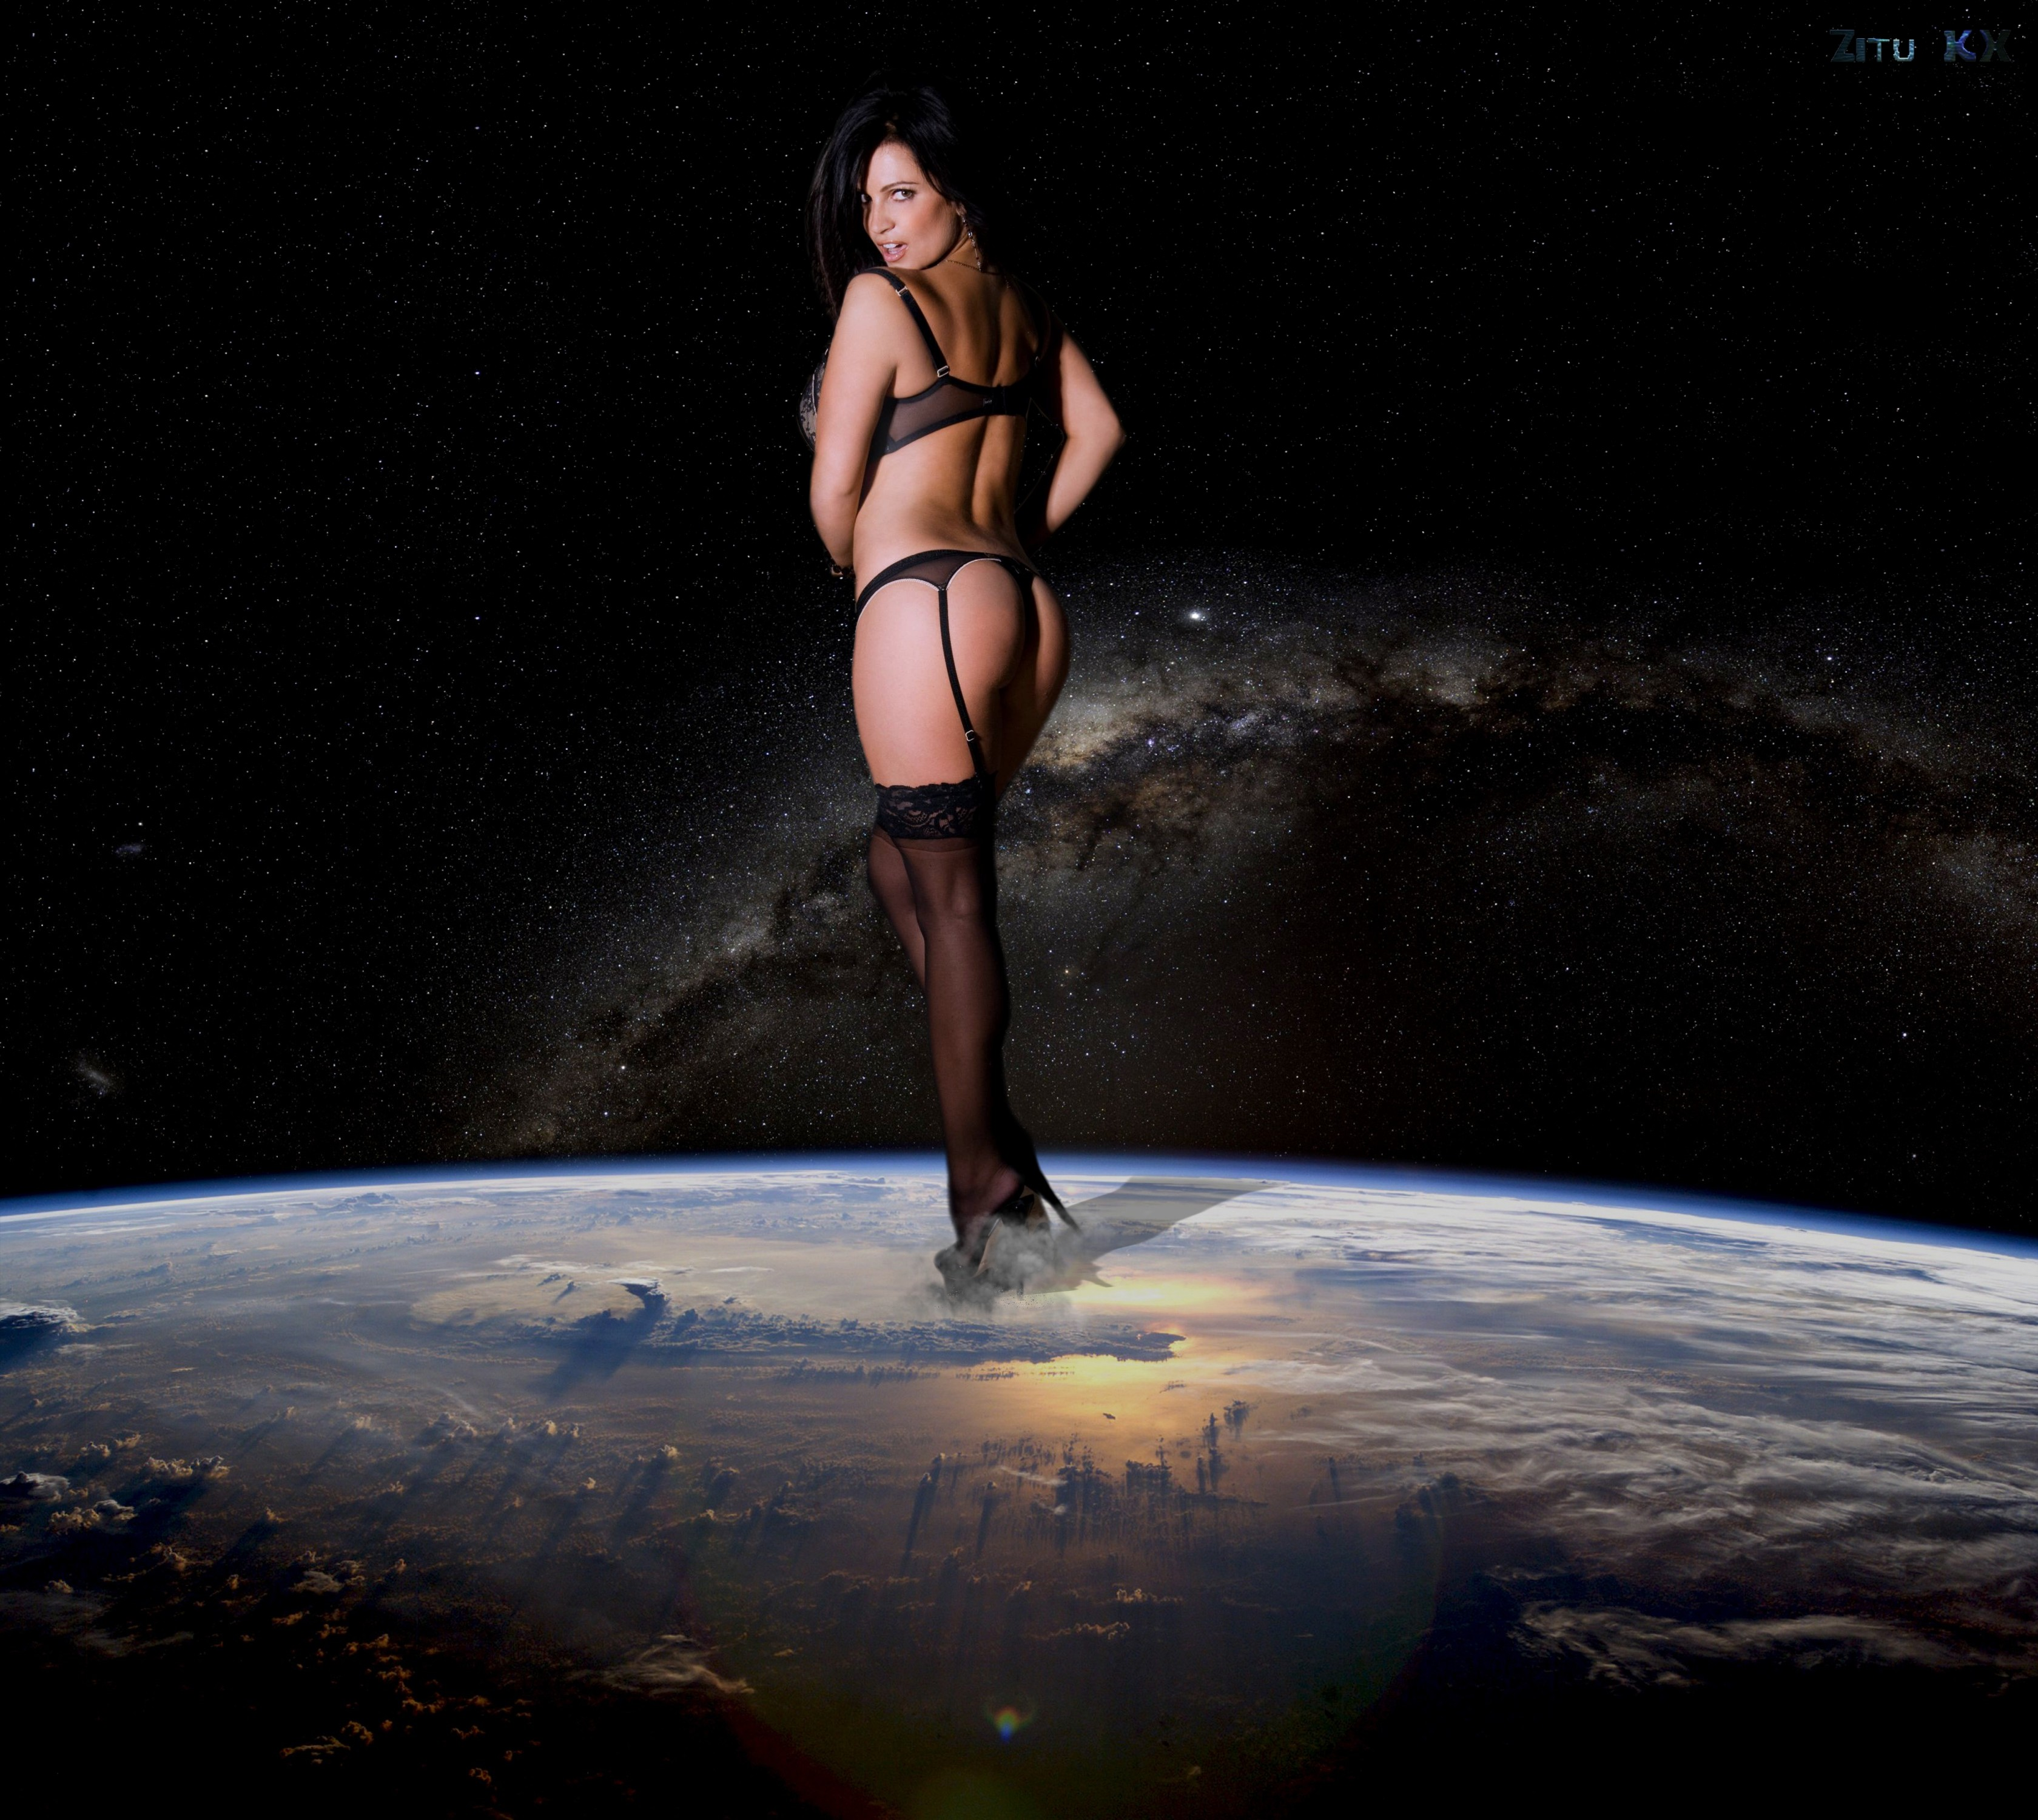 Growing Denise Milani (5) by ZituKX